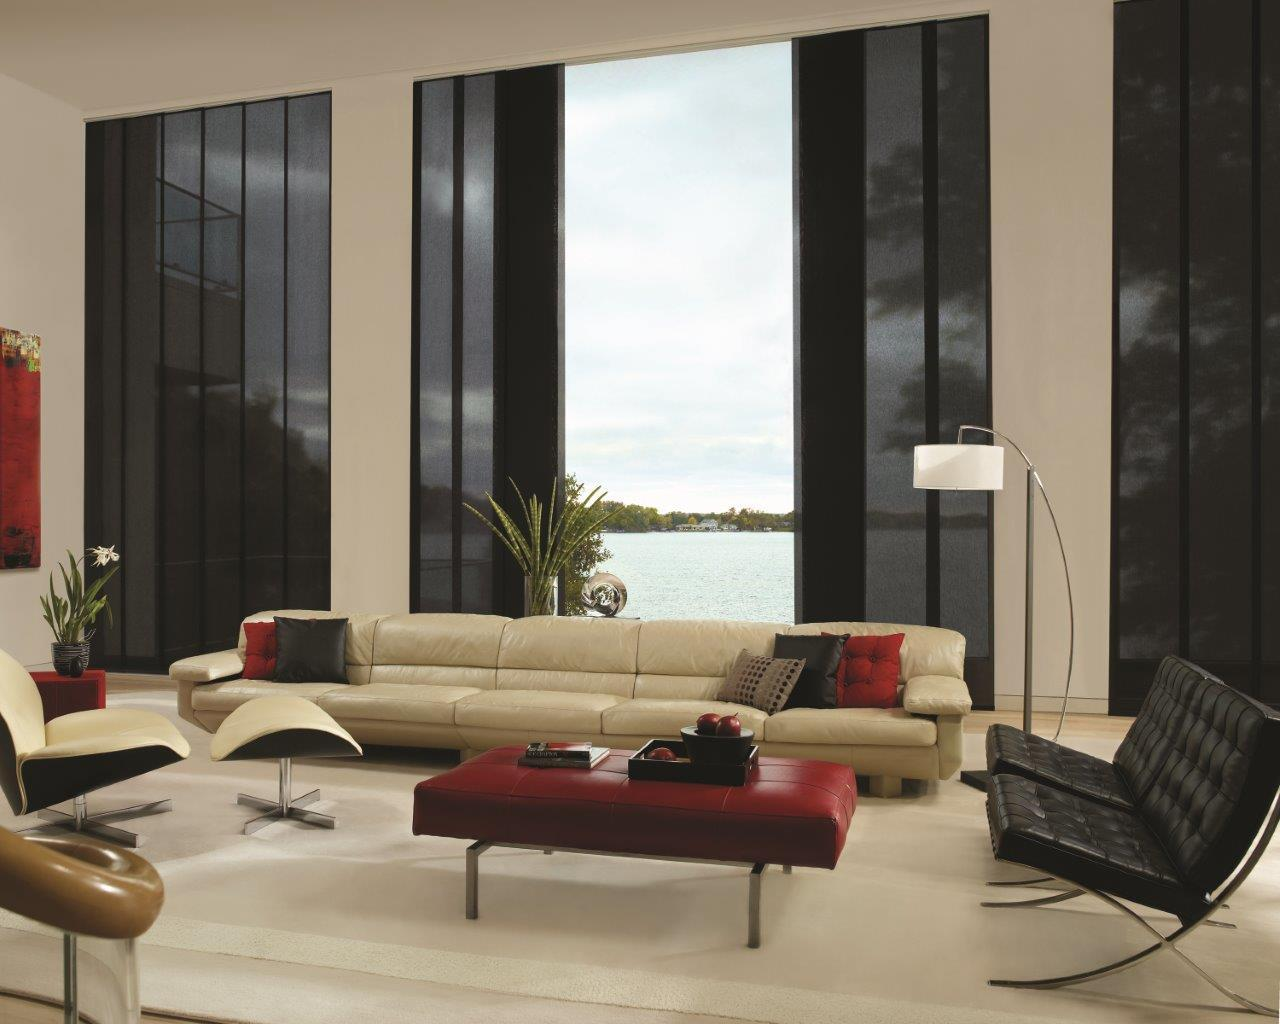 binnen-zonwering-raamdecoratie-assen4